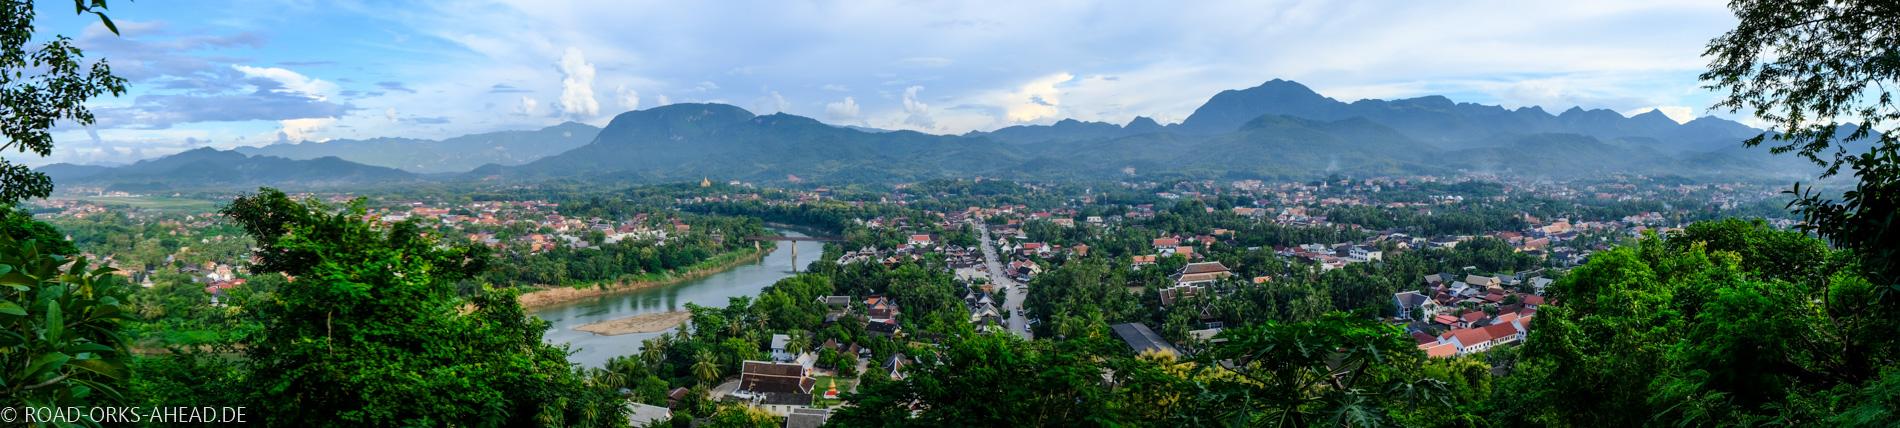 Phou Si Panorama, Luang Prabang